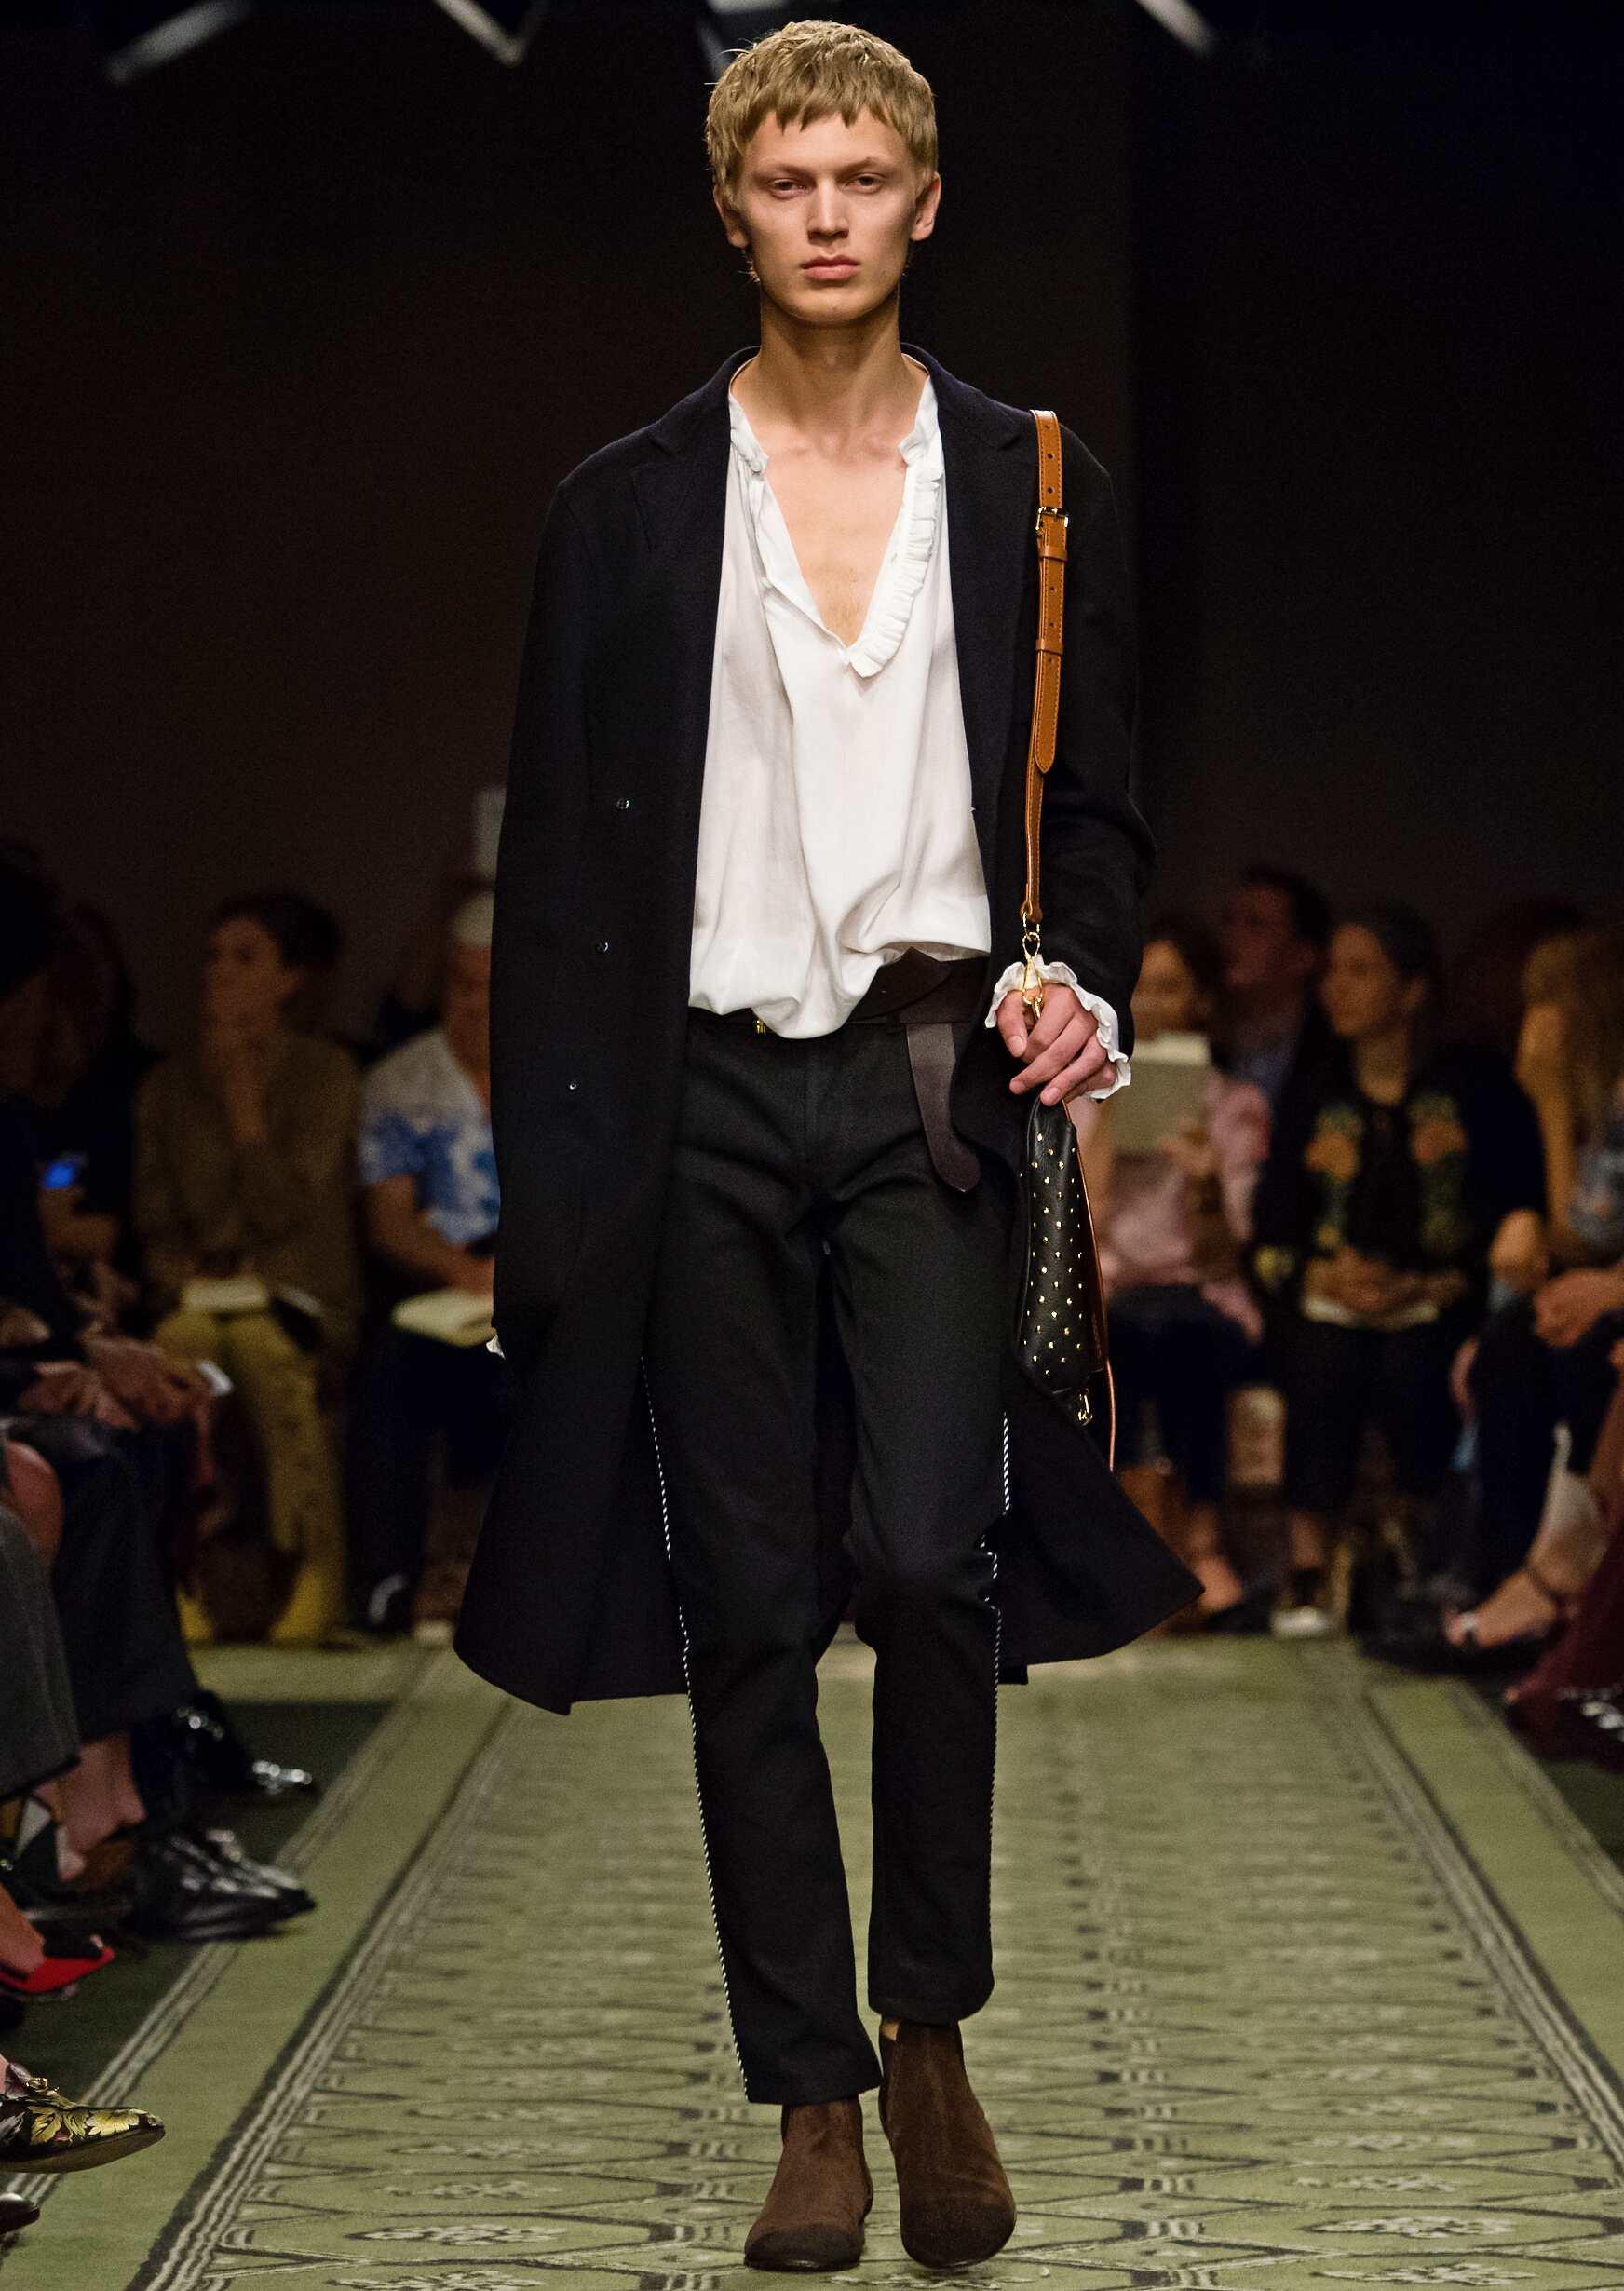 Fashion Man Model Burberry Catwalk